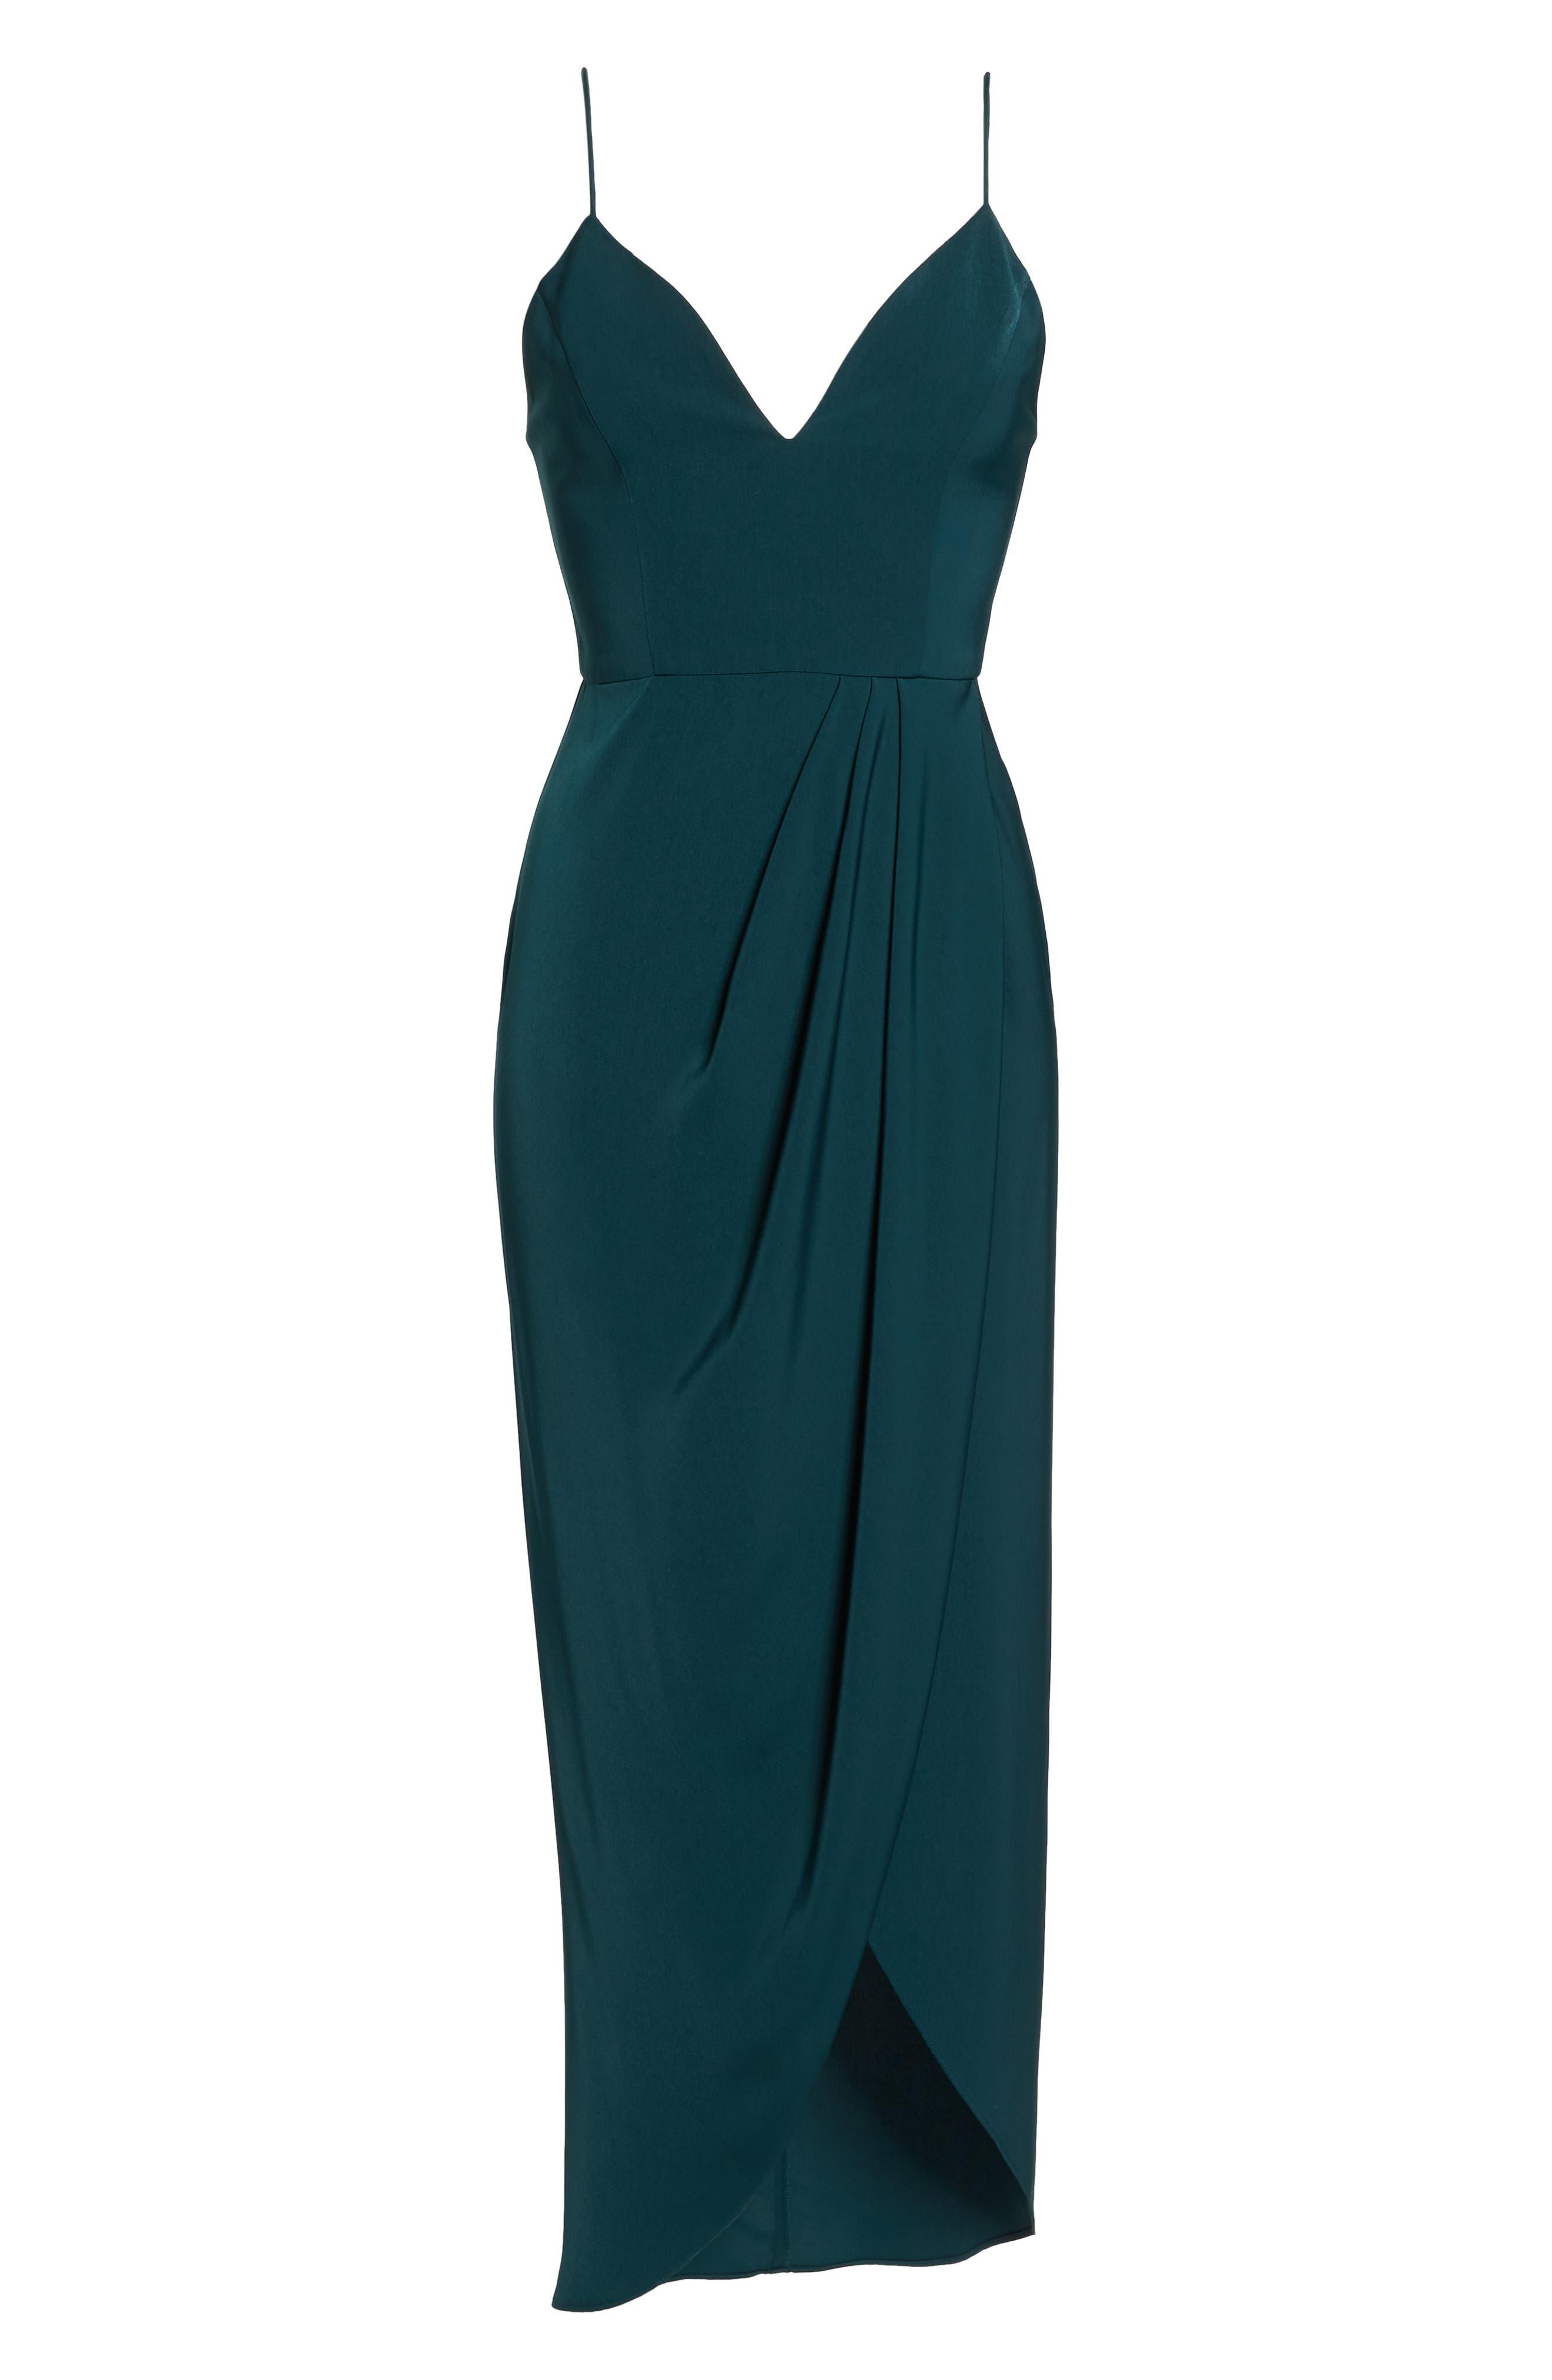 SHONA JOY, Tulip Hem Maxi Dress, Alternate thumbnail 7, color, SEAWEED